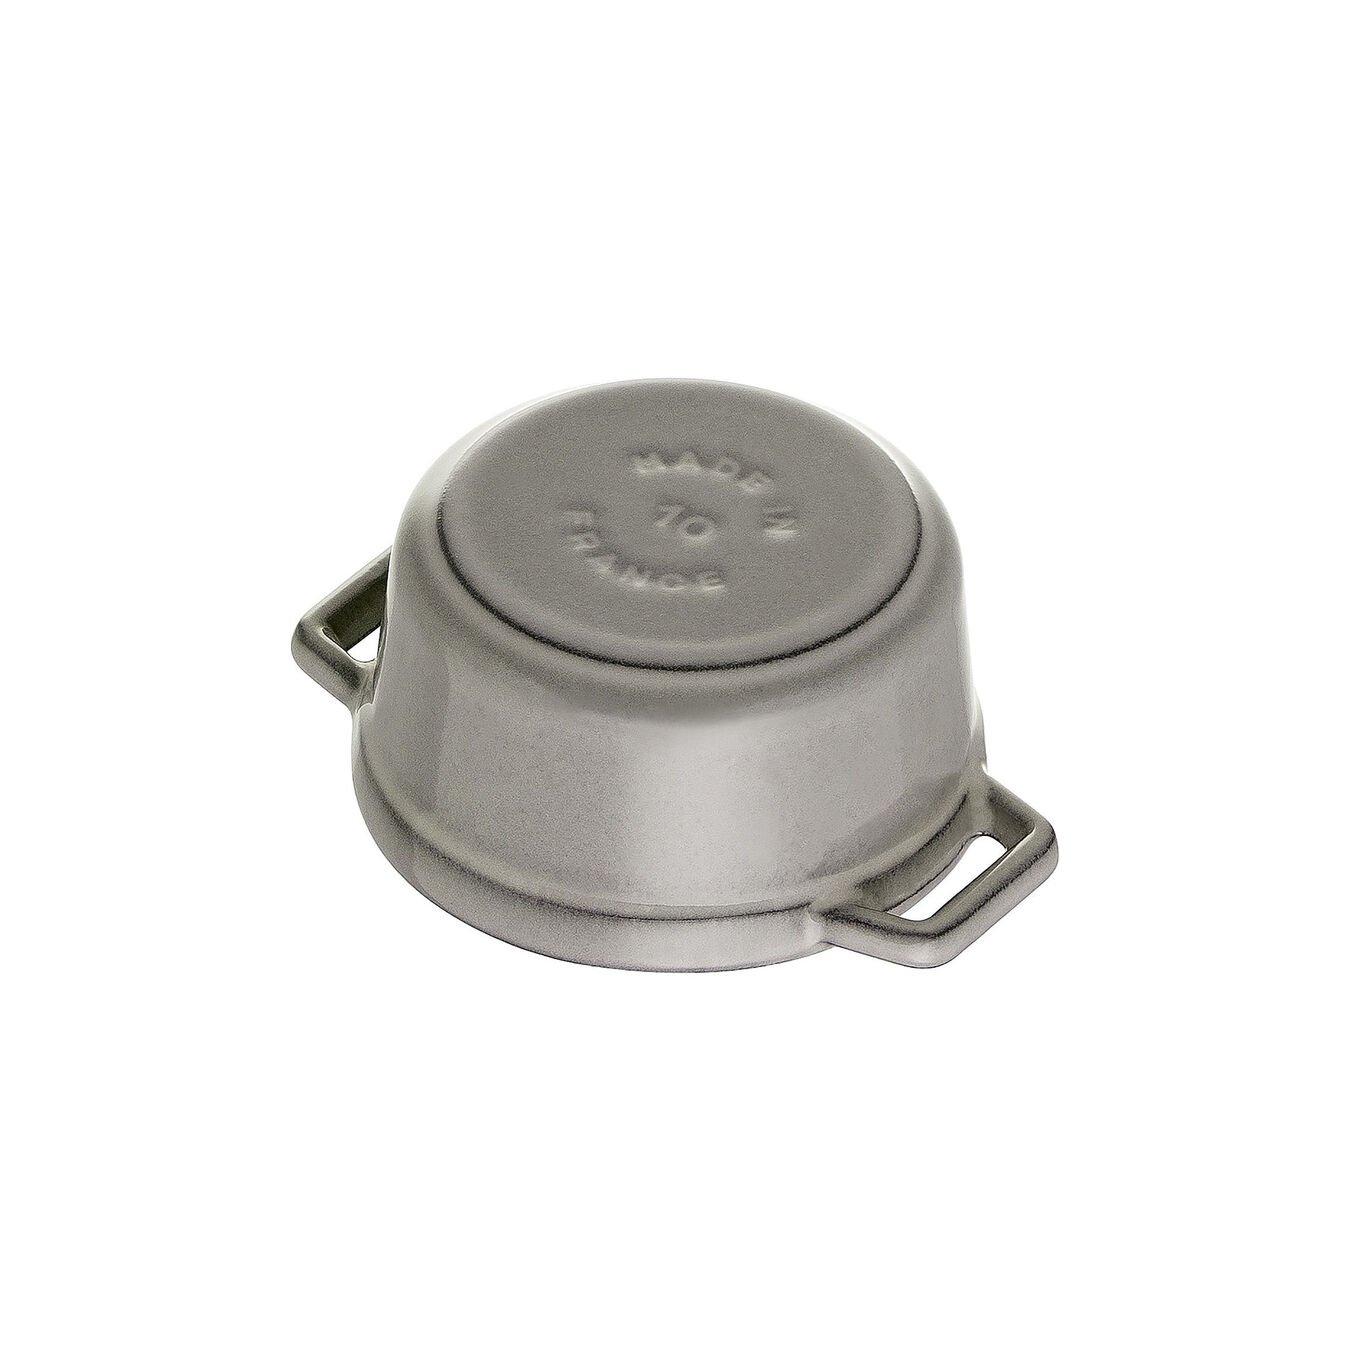 Mini Cocotte 10 cm, rund, Graphit-Grau, Gusseisen,,large 4